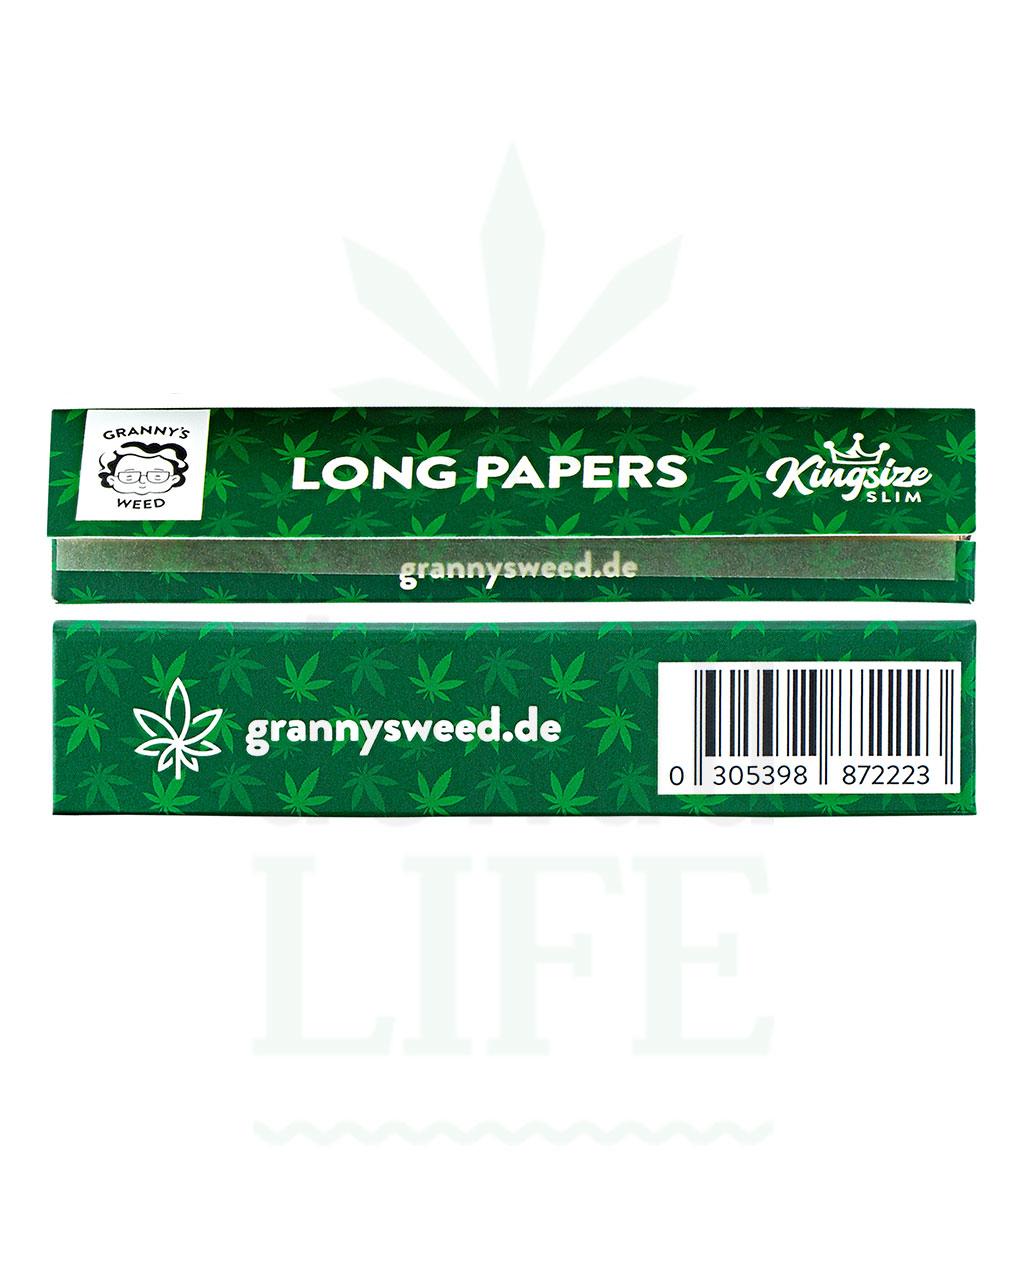 Beliebte Marken GRANNYS WEED Papers Kingsize | 32 Blatt